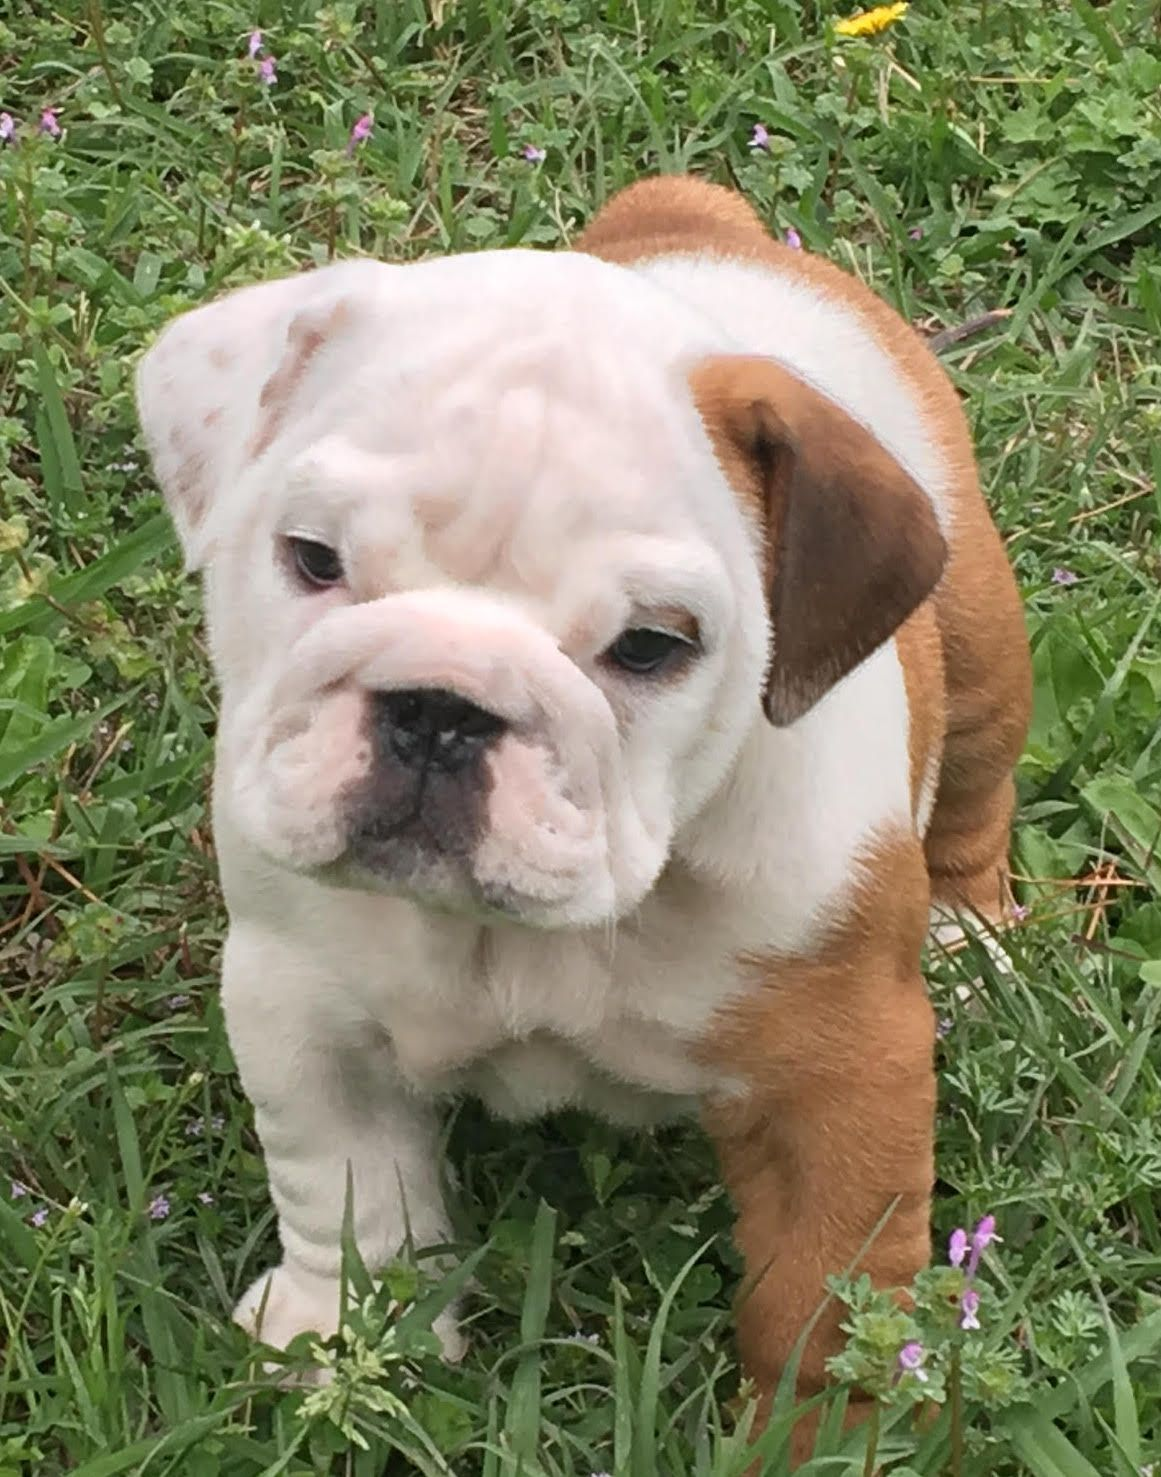 Moki Is A Piebald Maleenglish Bulldog Puppy With Champion Lines